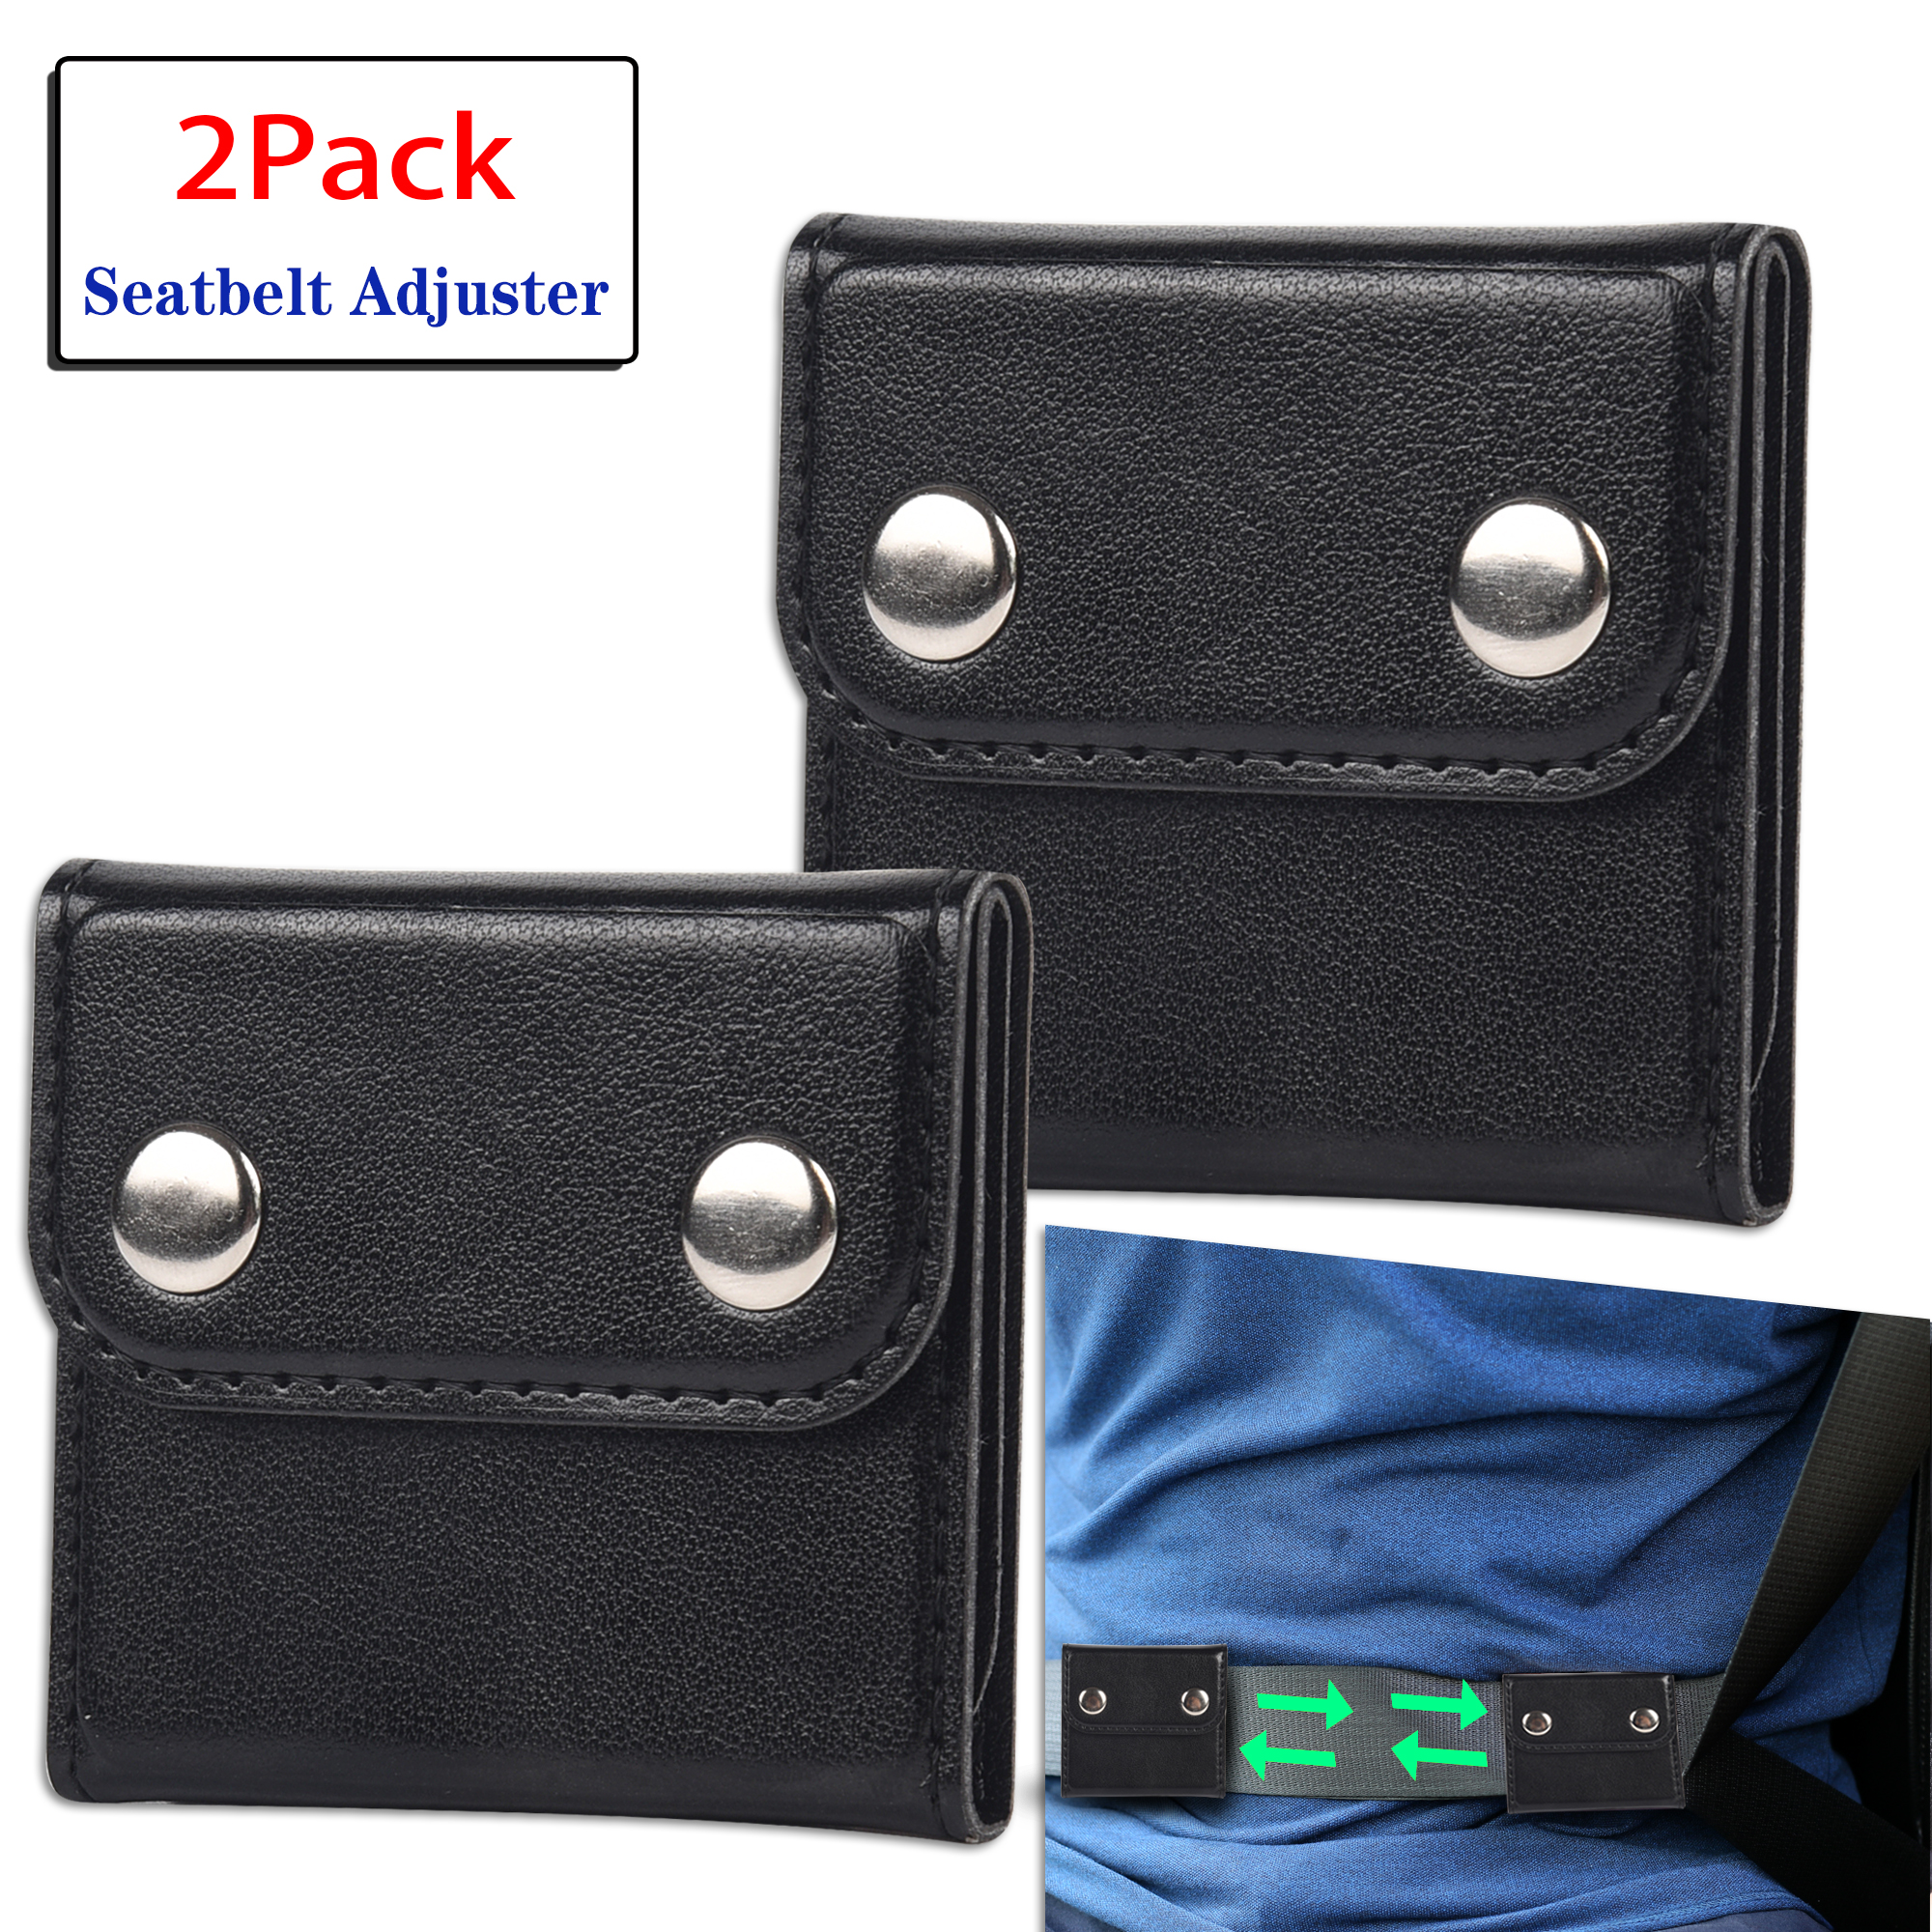 Seatbelt Locking Clip 2-pack